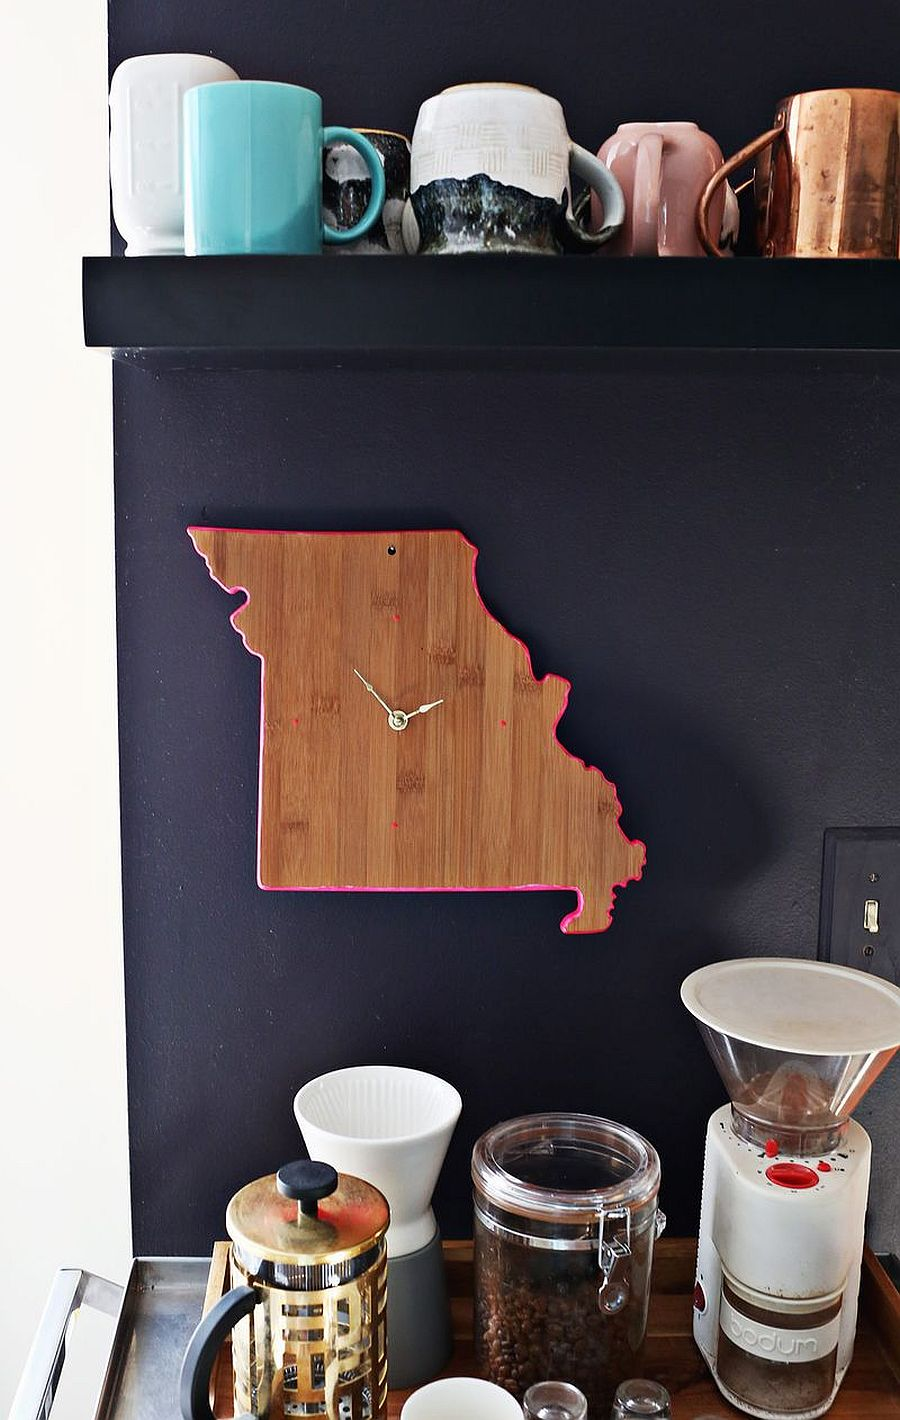 DIY cutting board clock